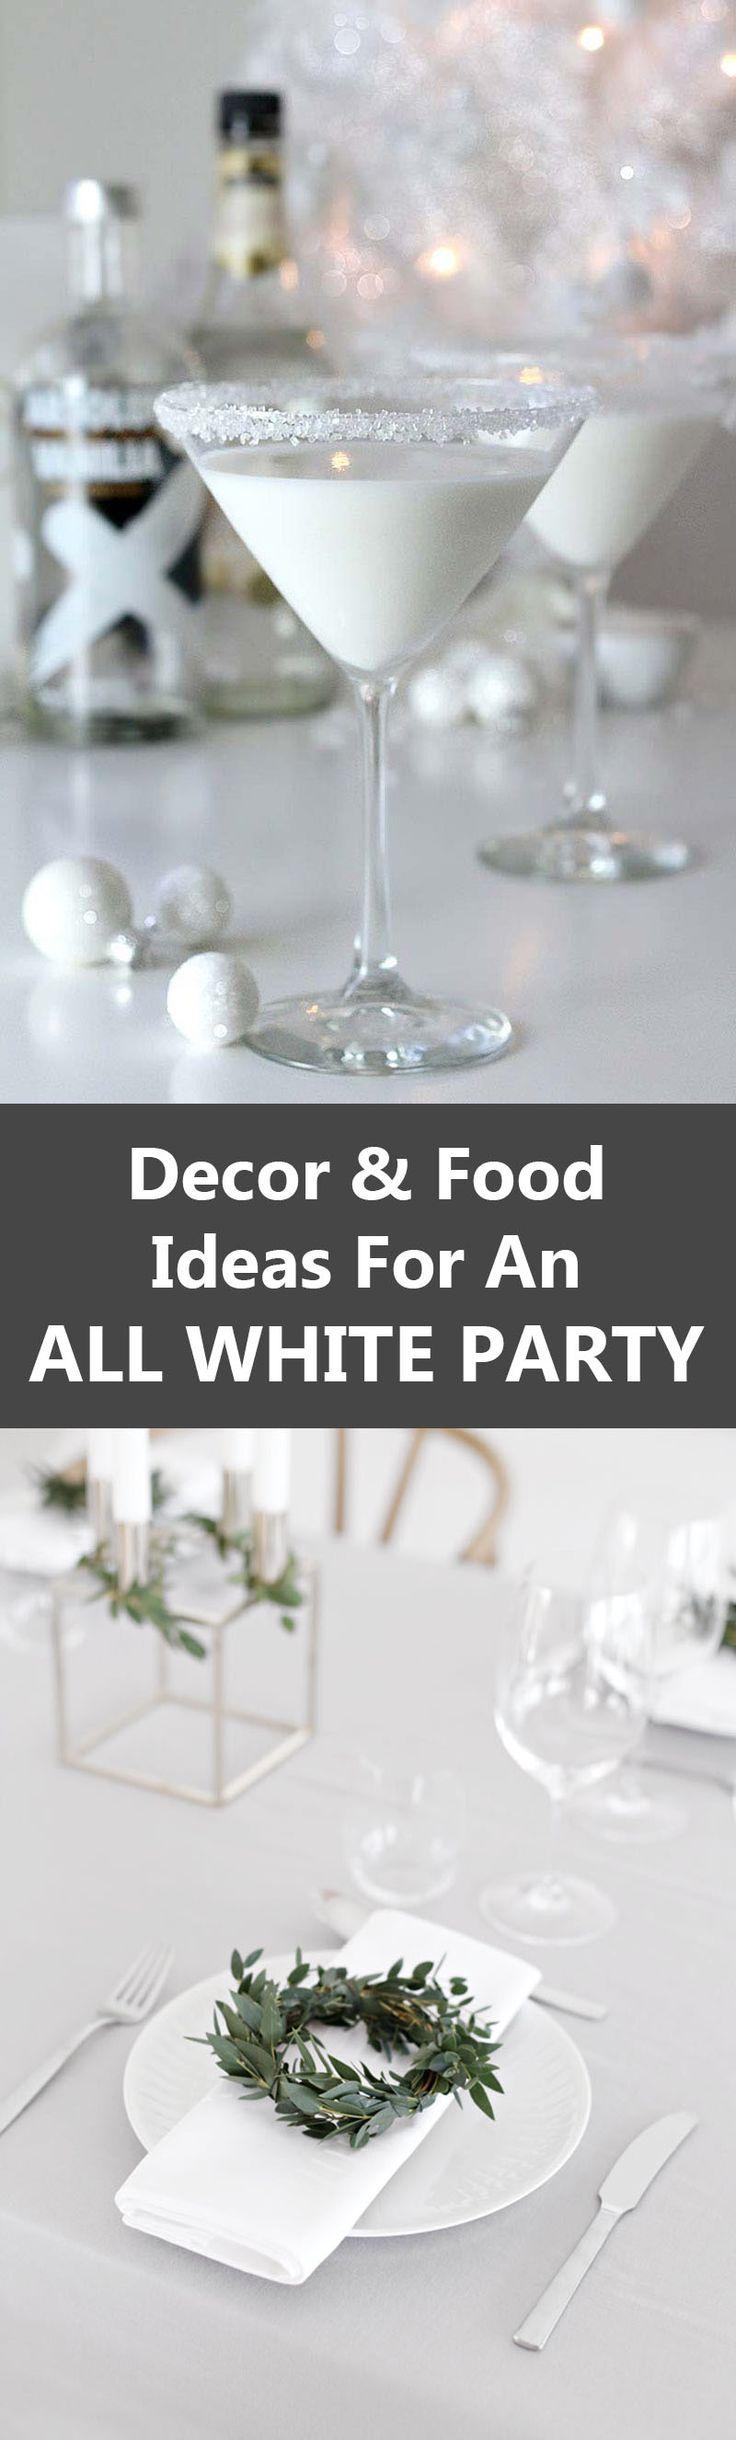 Best 25 all white party ideas on pinterest white party for Images of all white party decorations